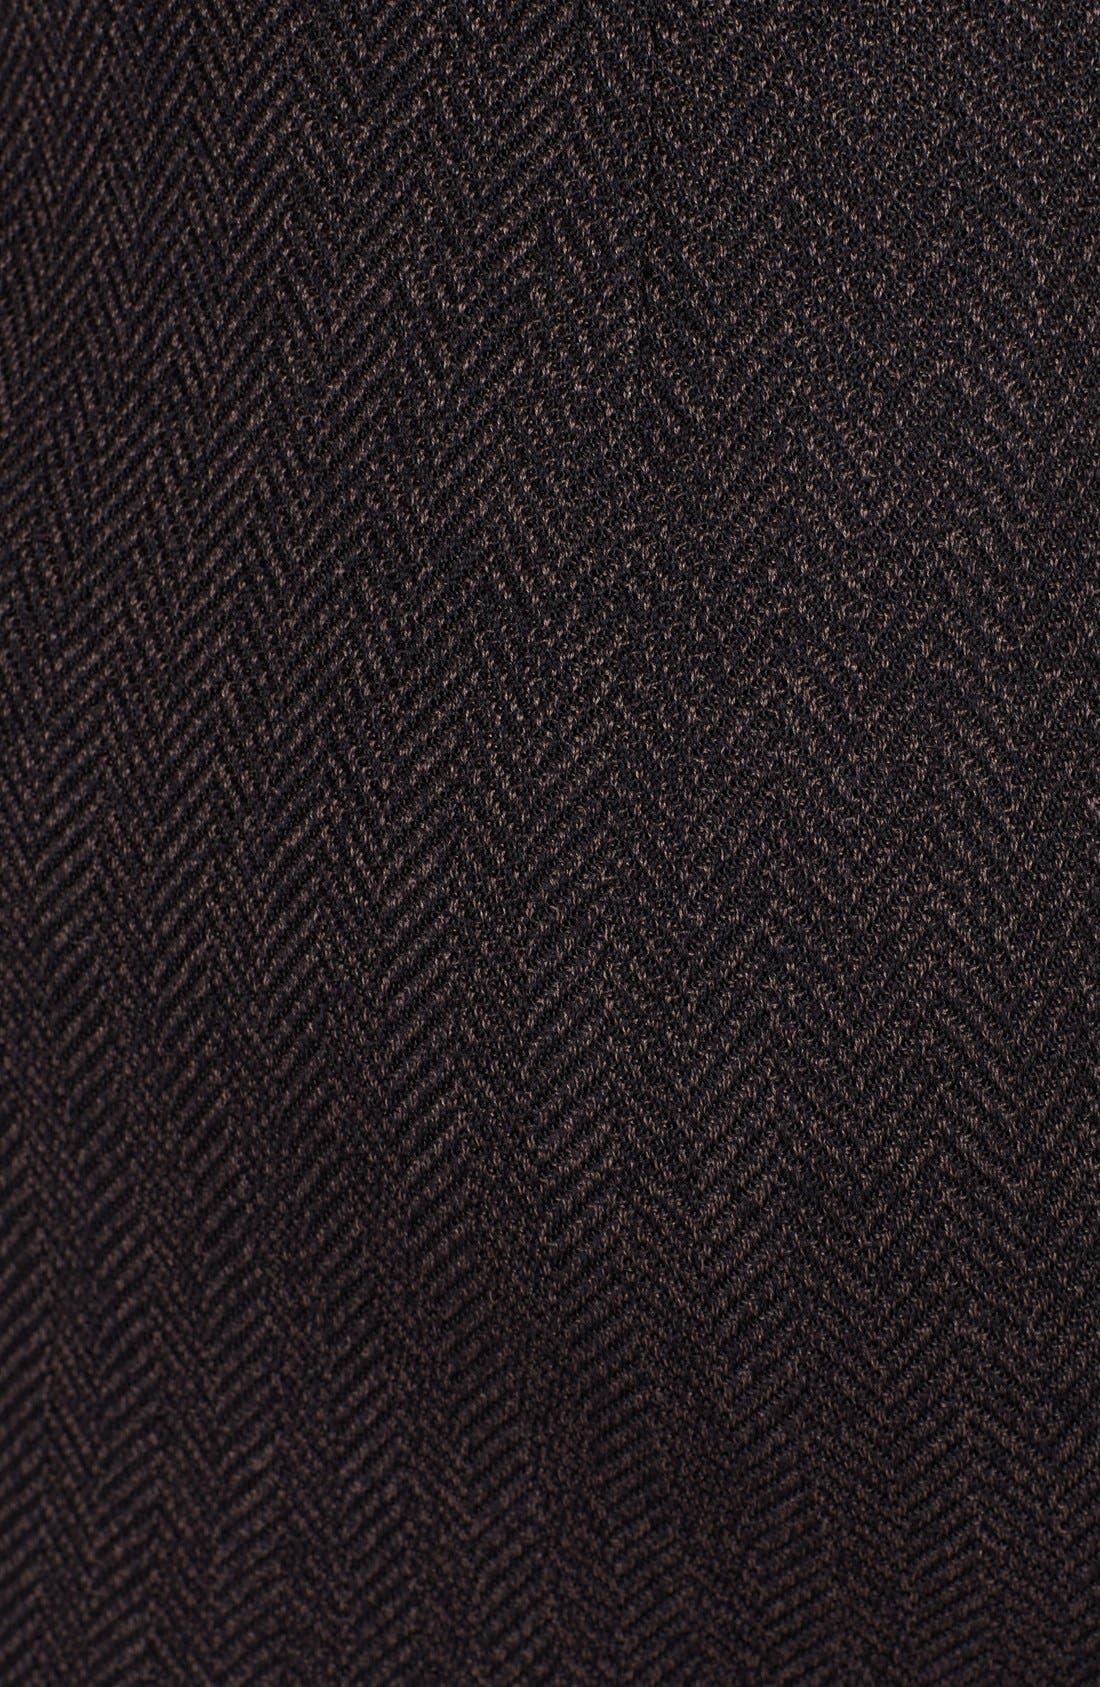 Alternate Image 3  - St. John Collection Bouclé Herringbone Knit Skirt